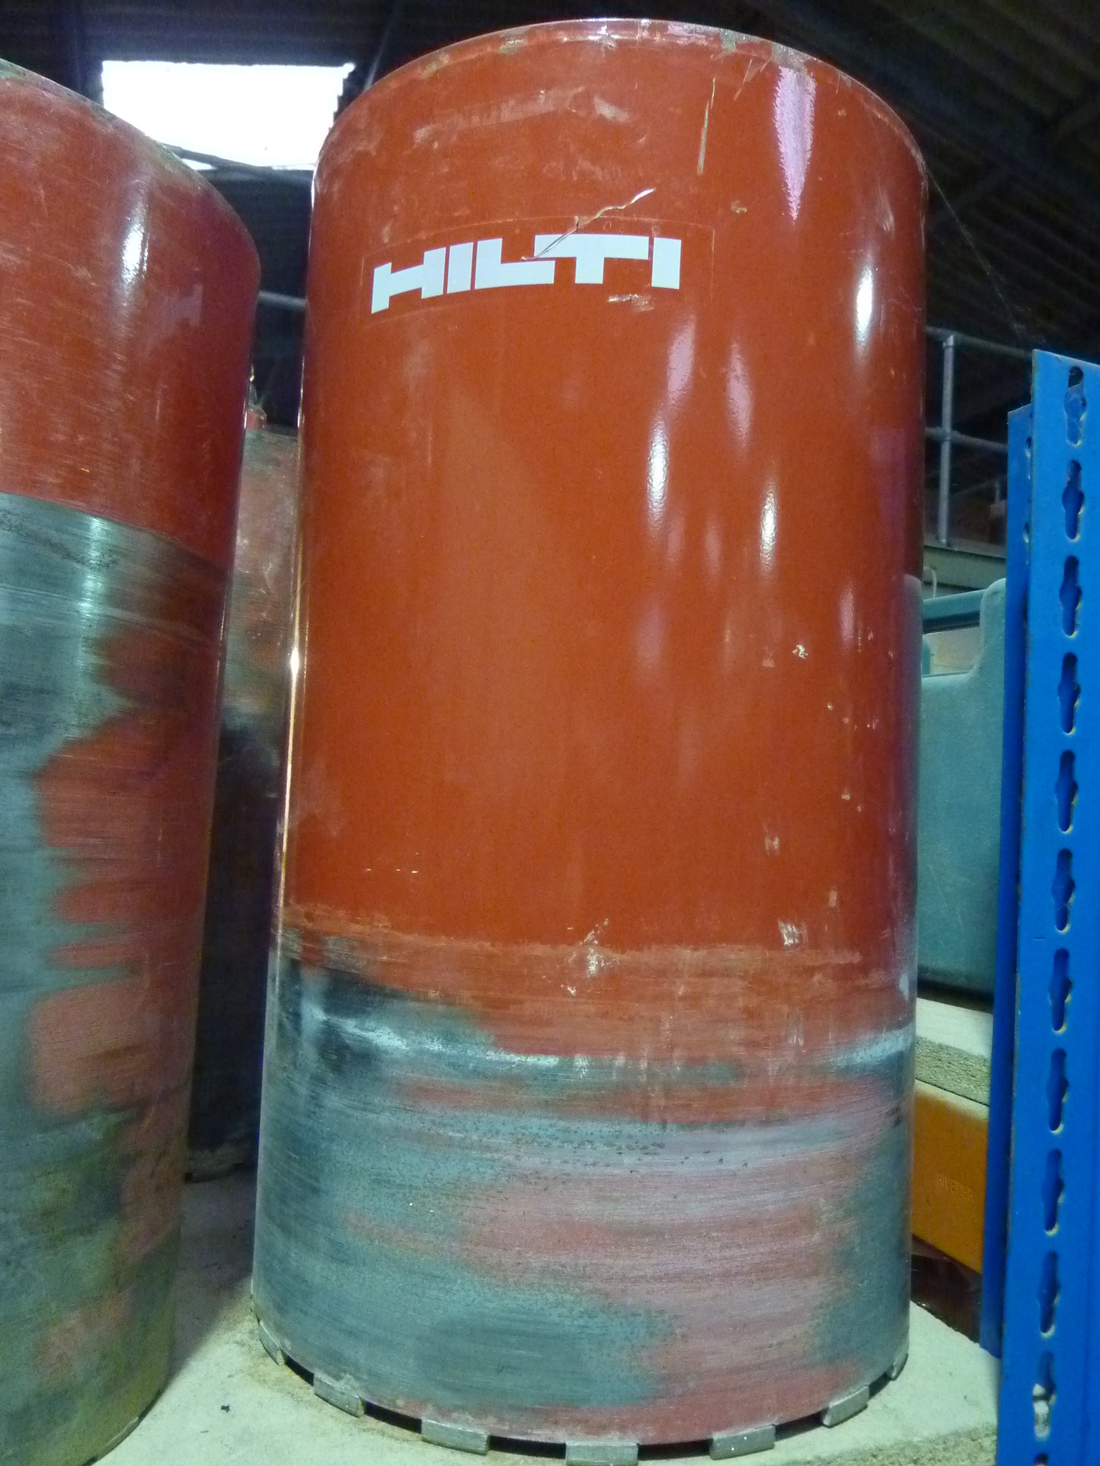 Hilti DD130 Wet Diamond Core 30mm